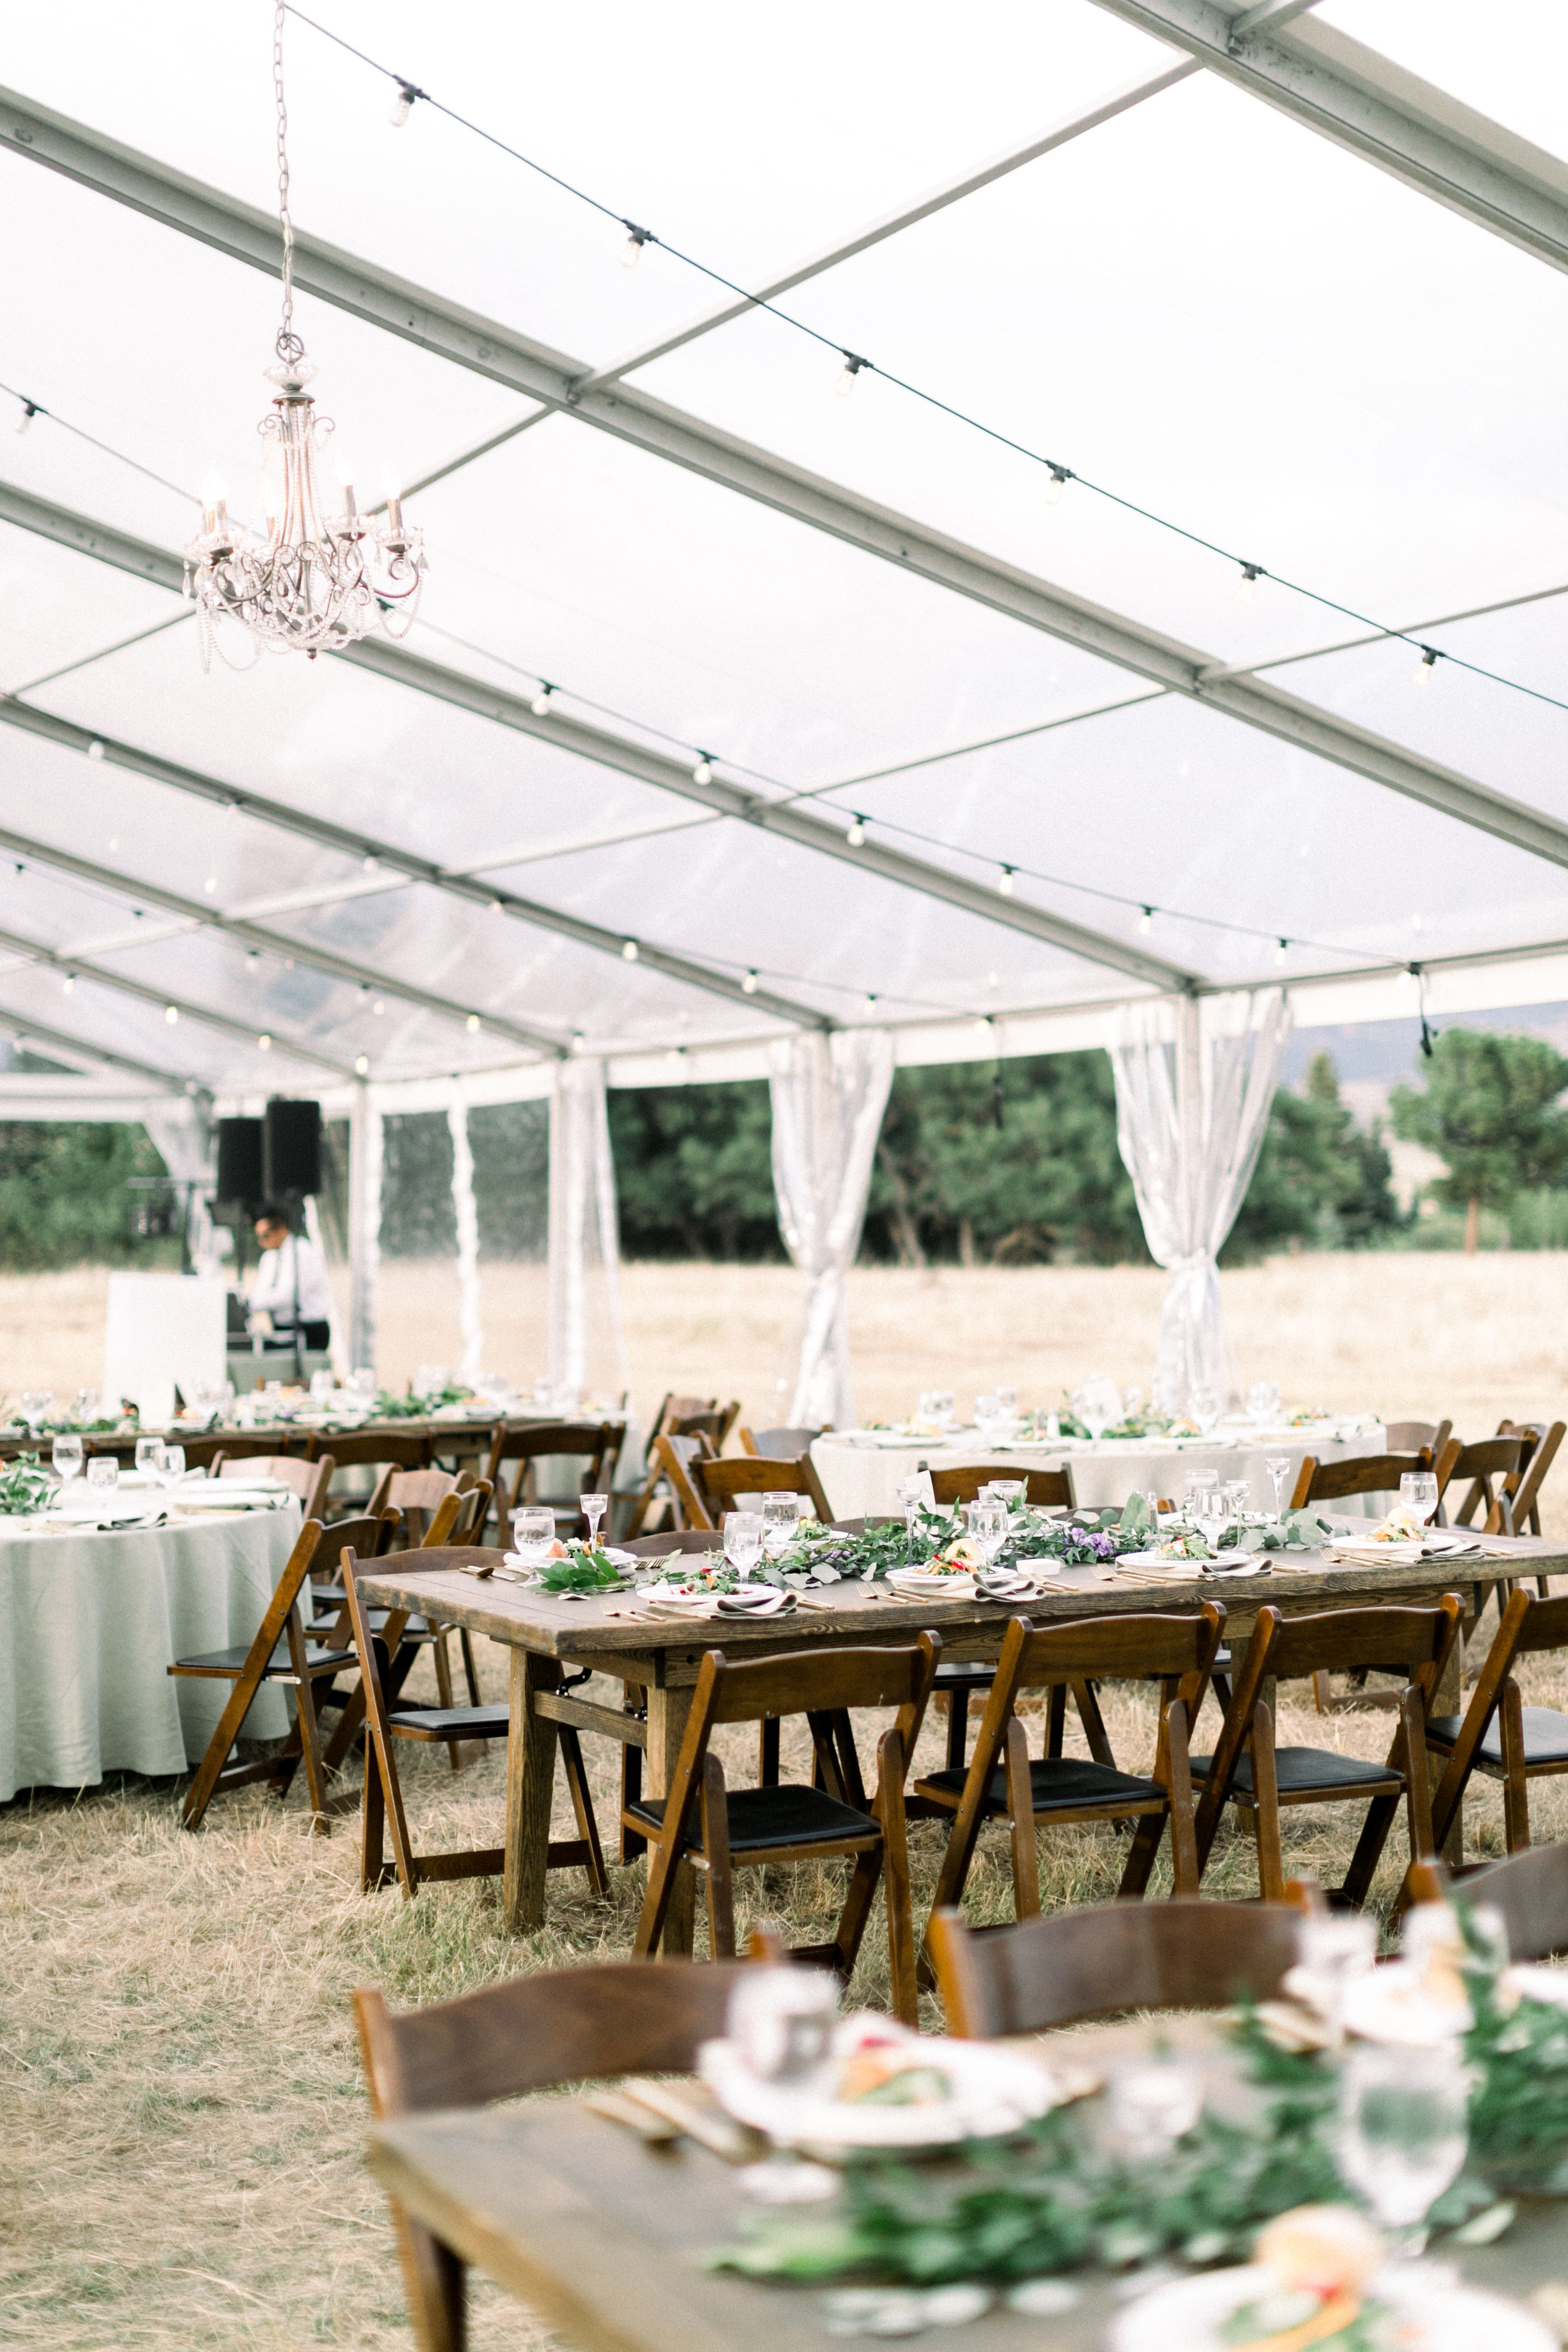 Tent Rentals Tent Rentals North Fork Wedding Yard Wedding